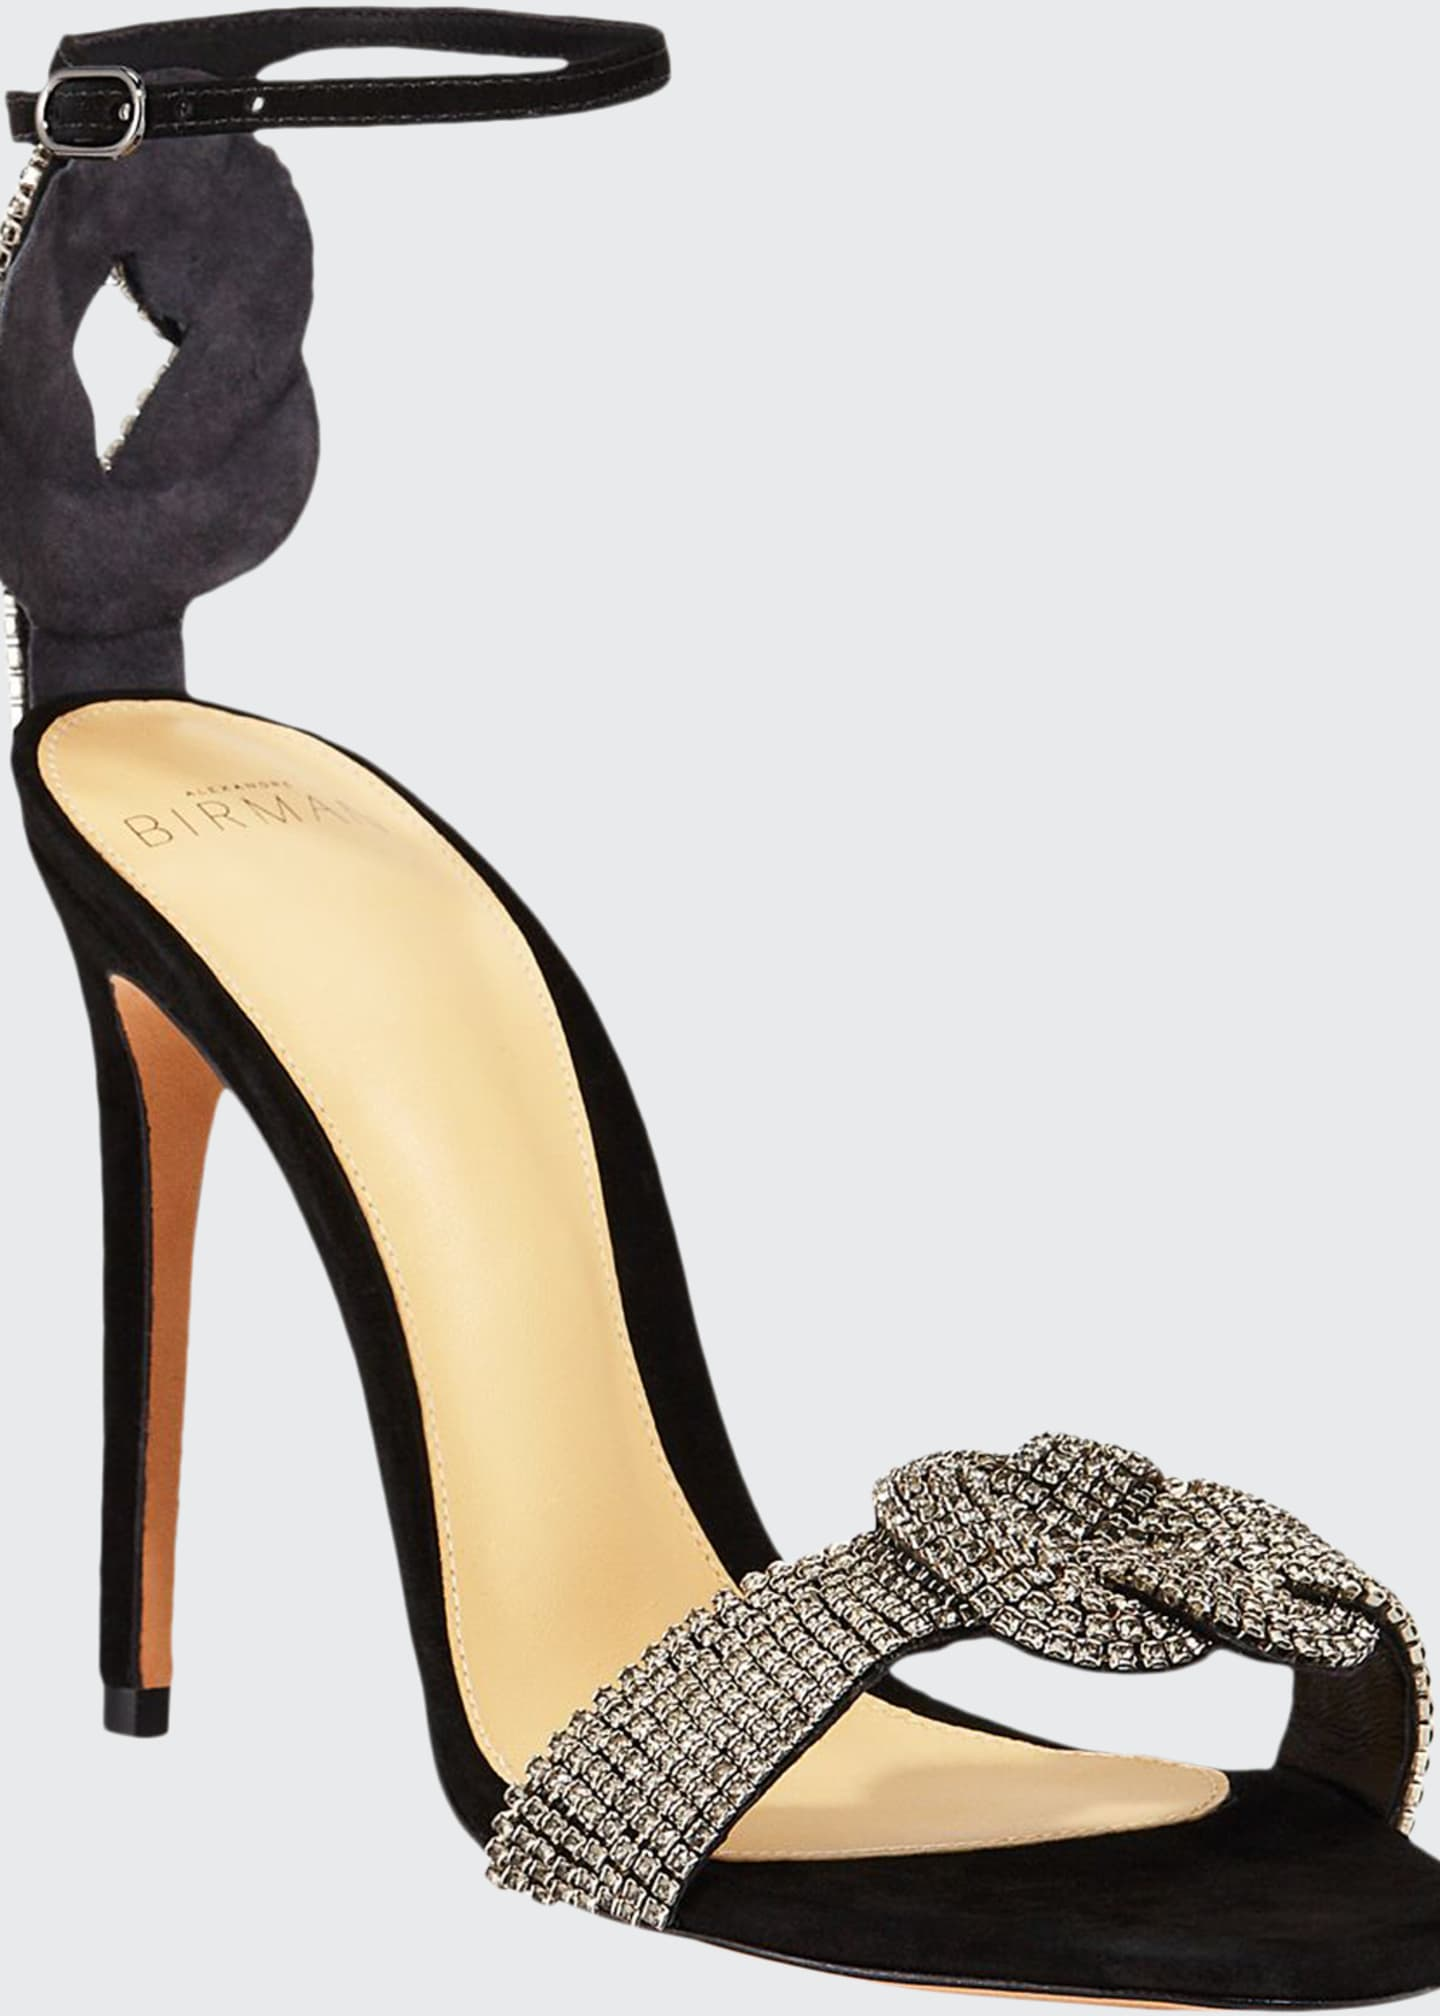 Alexandre Birman Vicky Crystal Suede Ankle-Strap Sandals